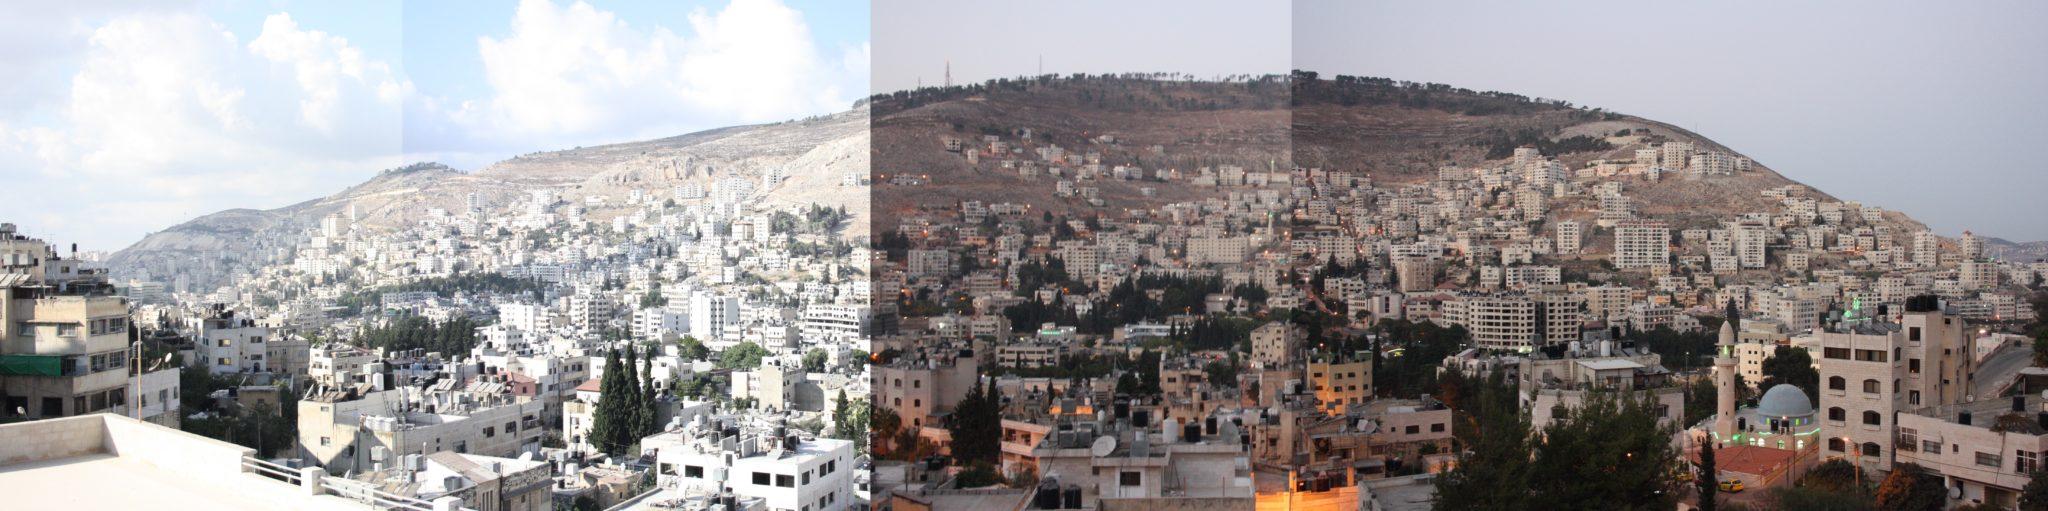 Nablus-Time-Lapse.jpg